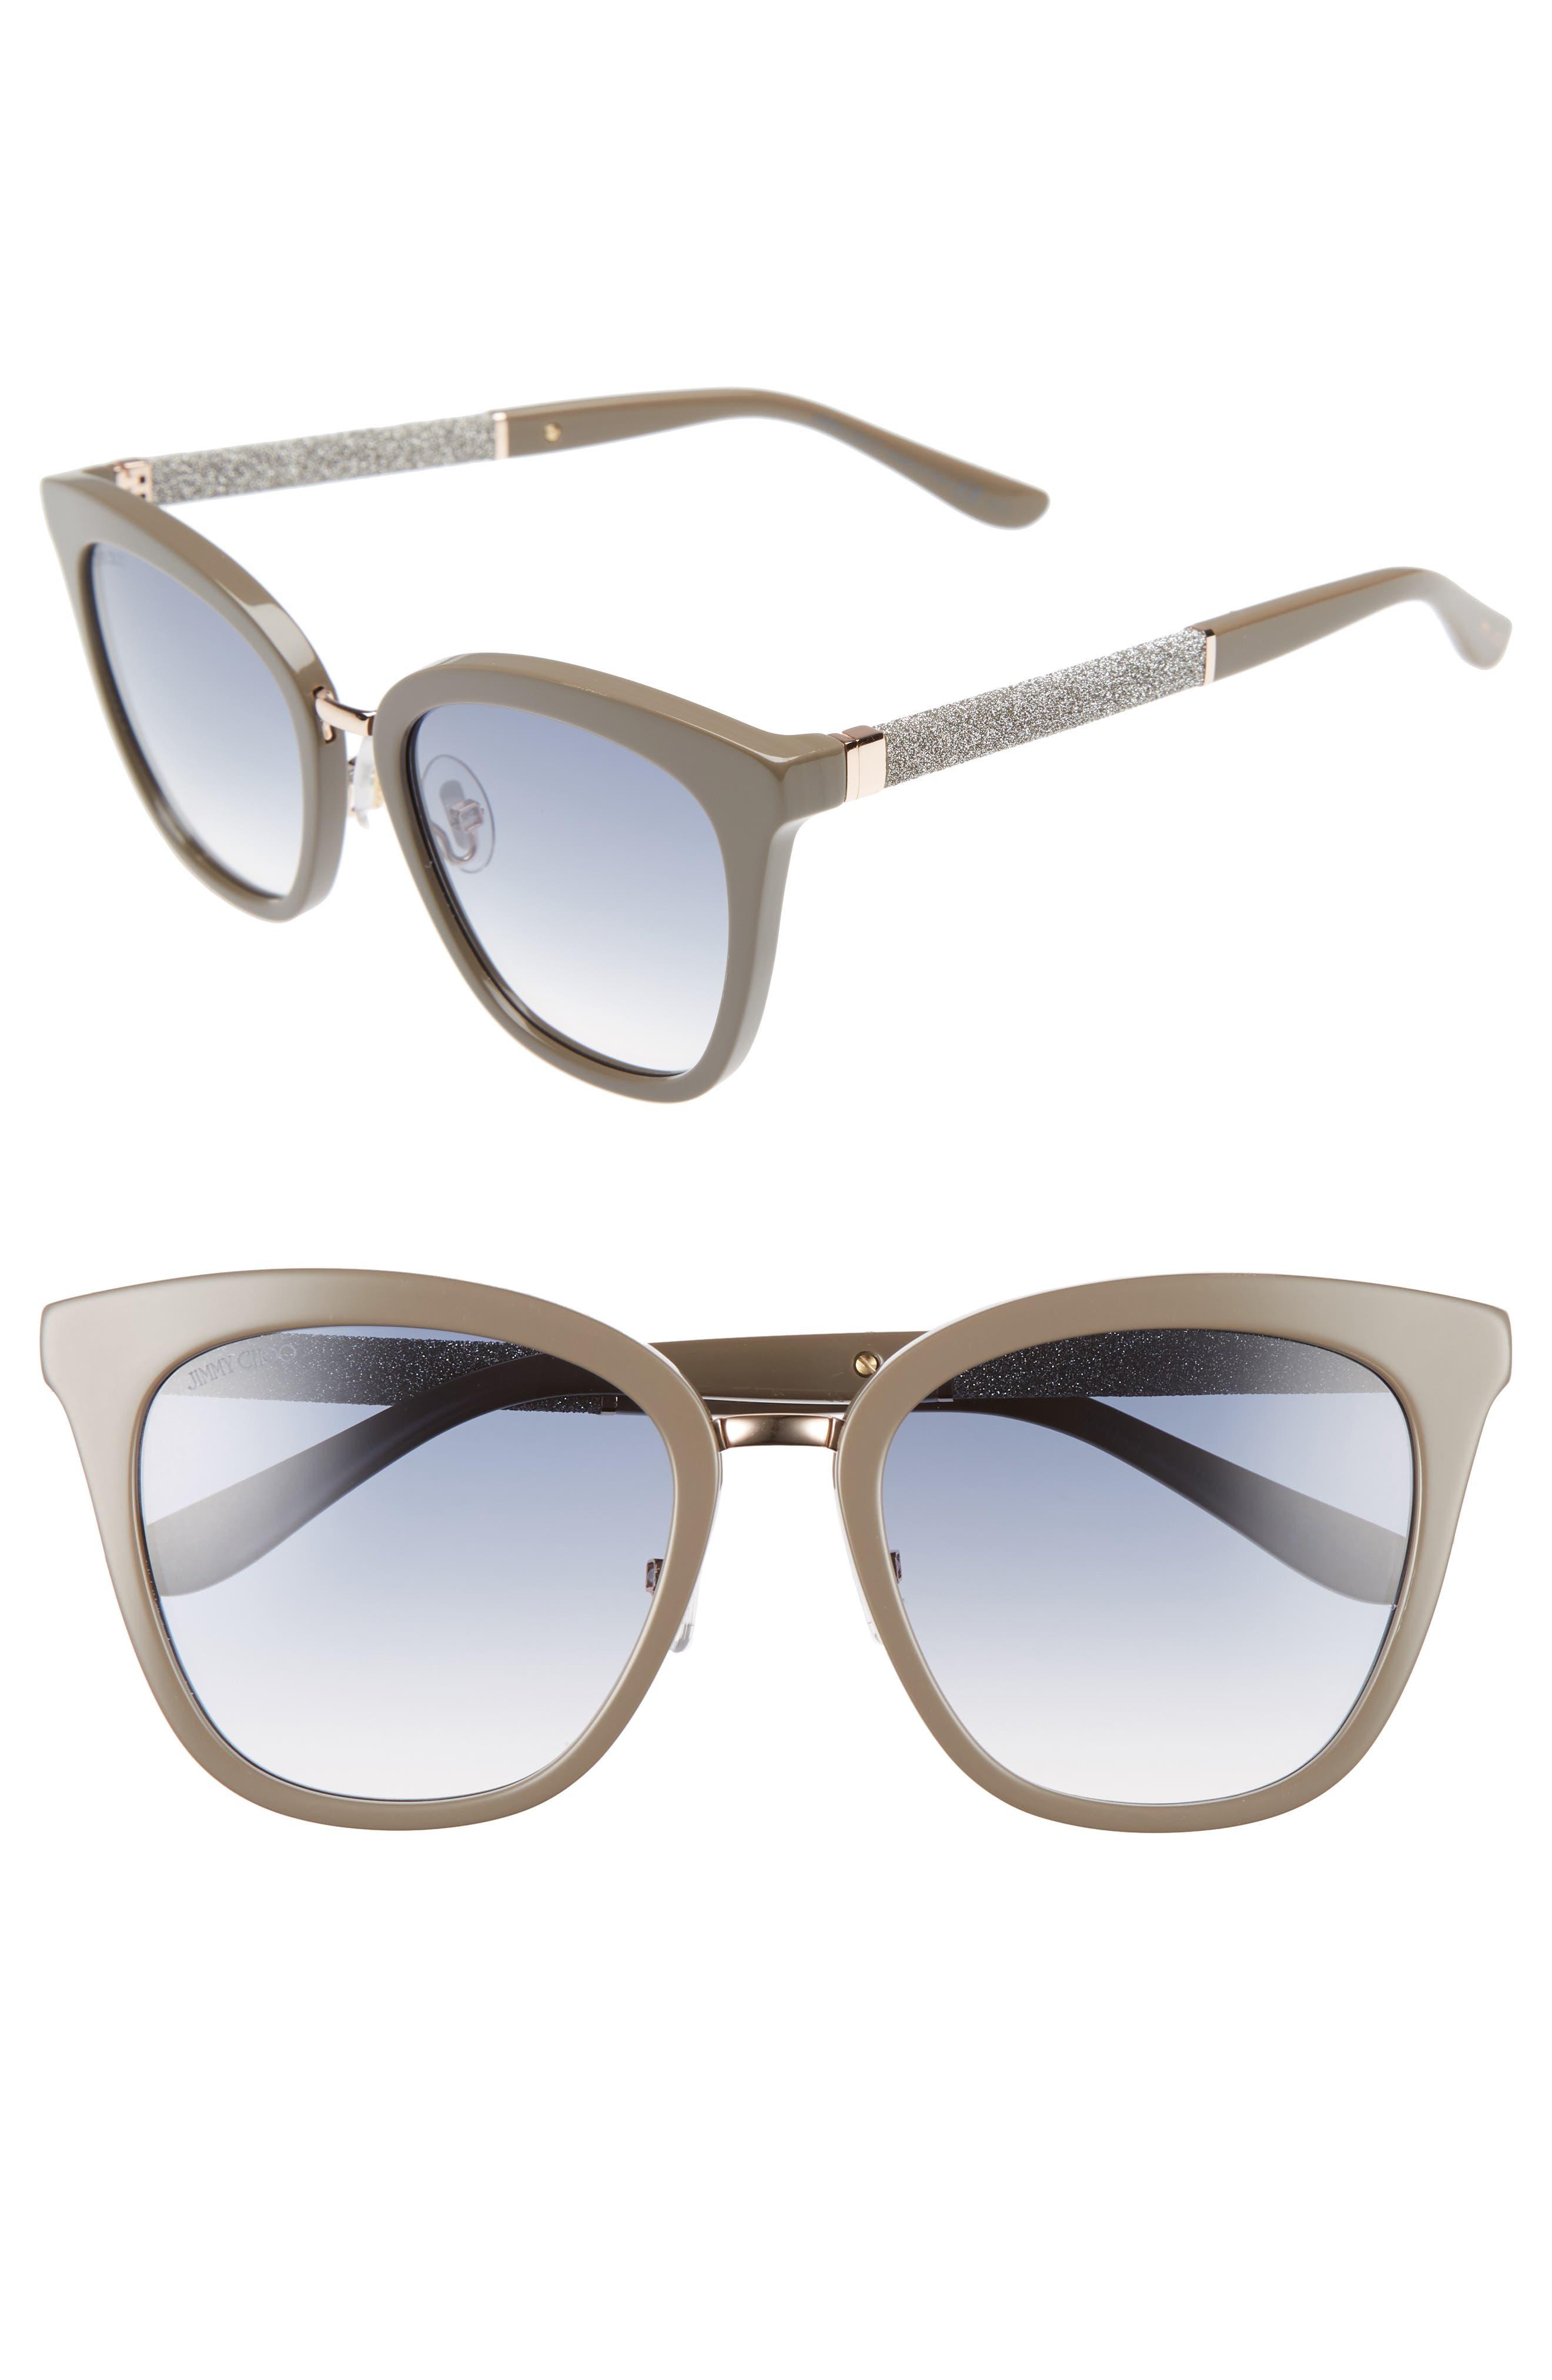 Alternate Image 1 Selected - Jimmy Choo Fabry 53mm Sunglasses